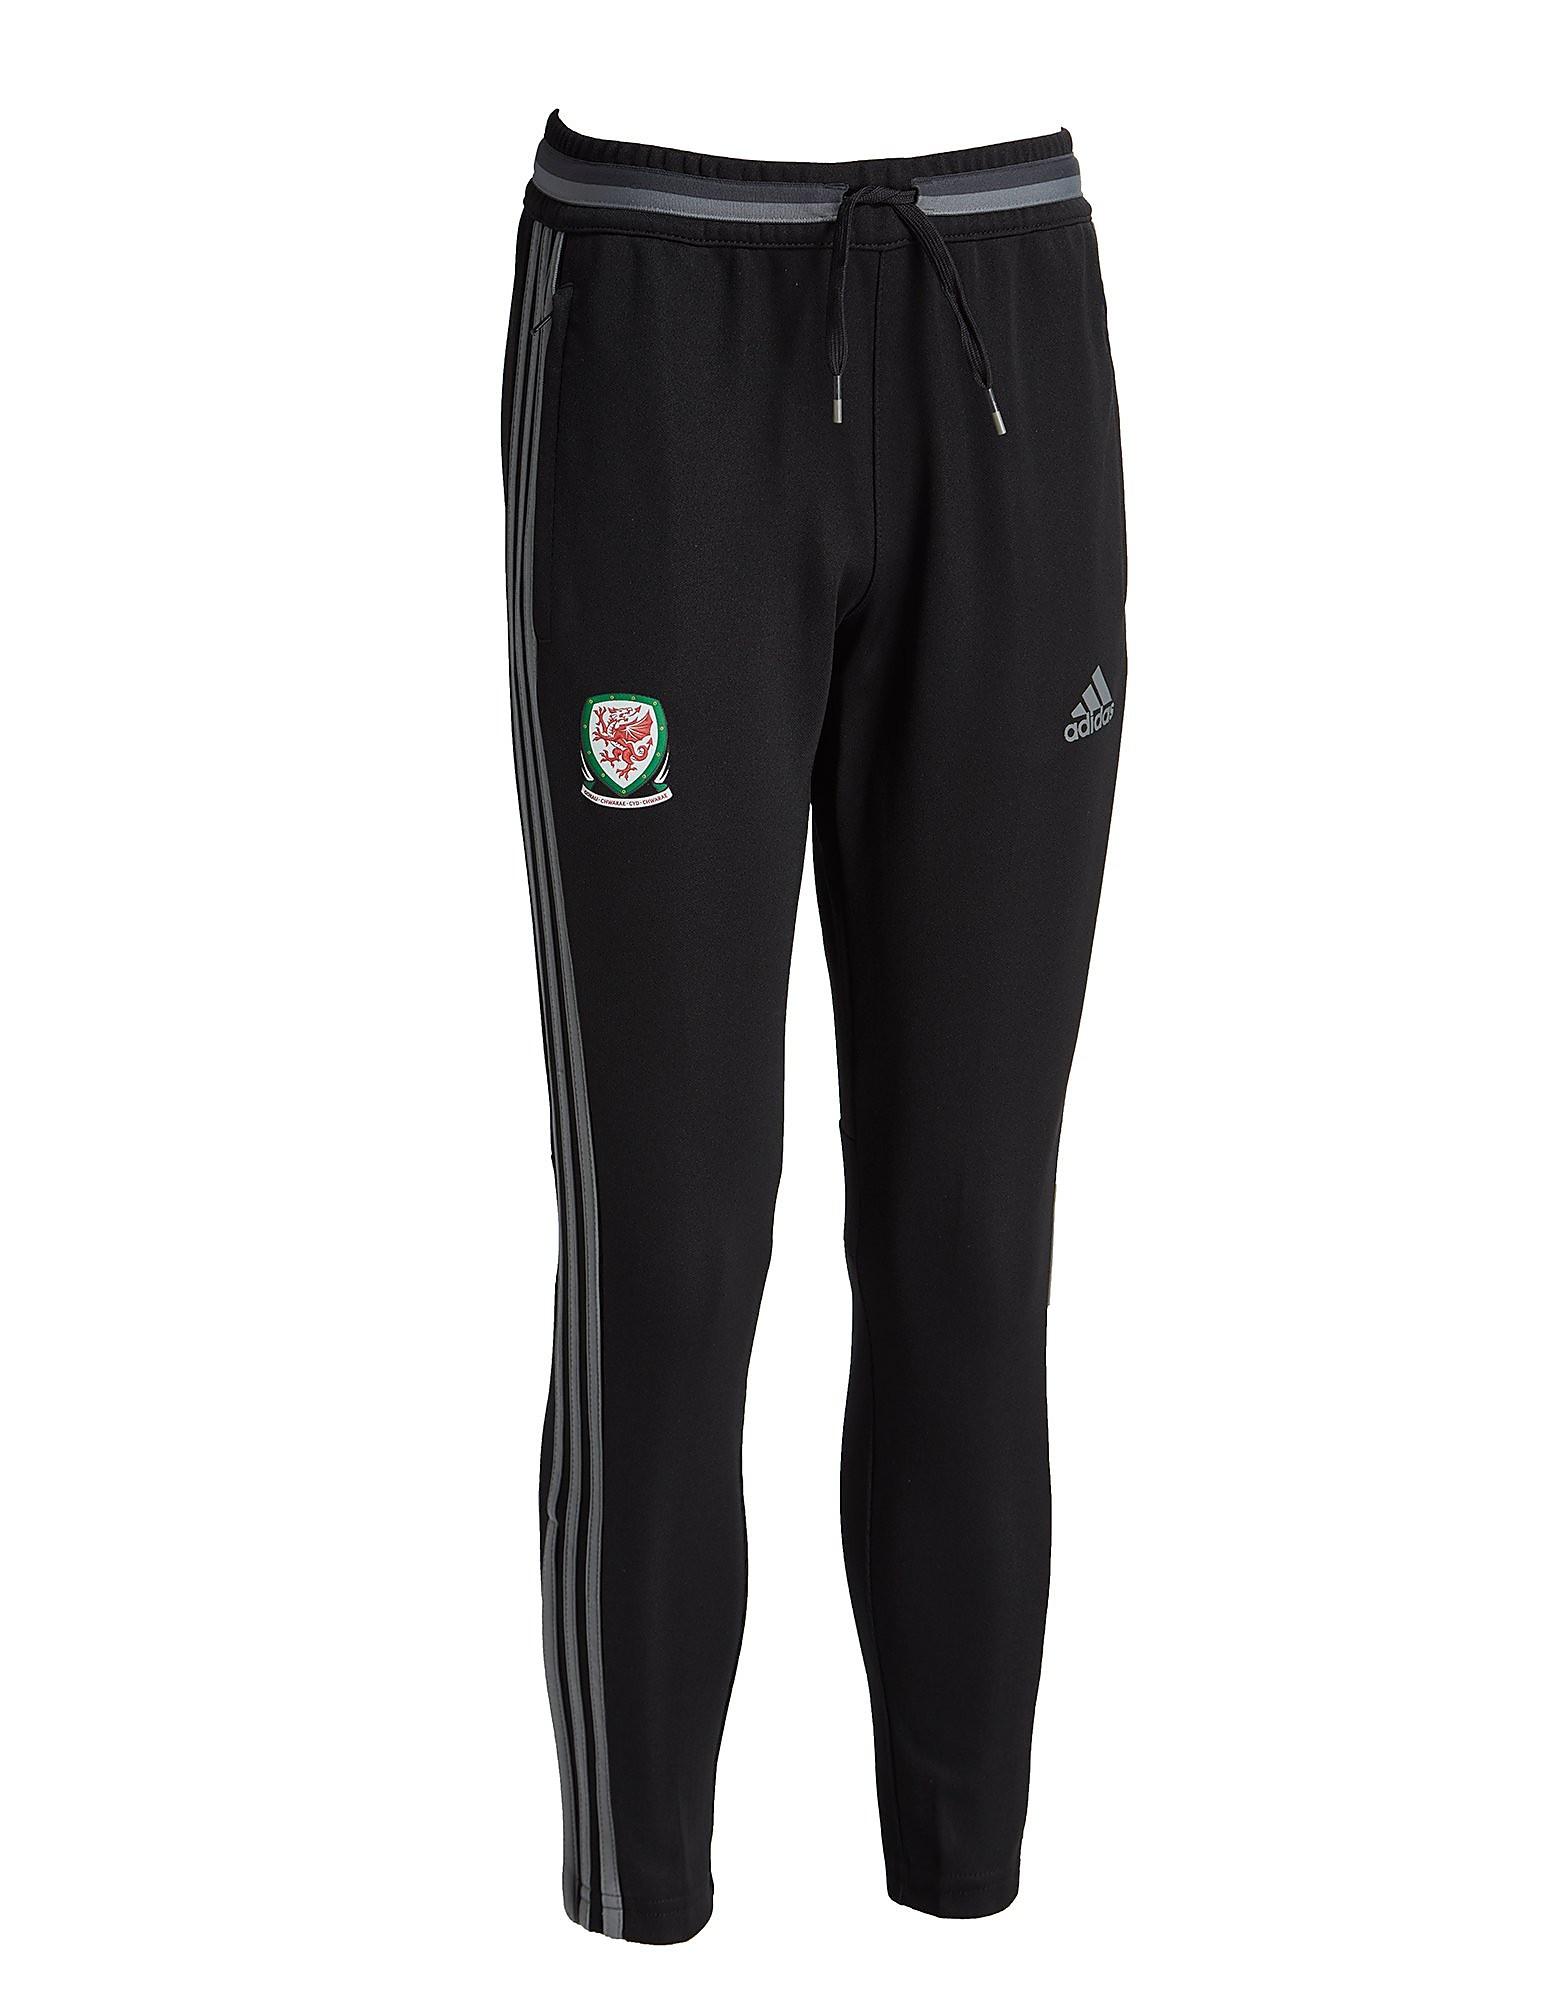 adidas Wales 2016/17 Training Pants Junior